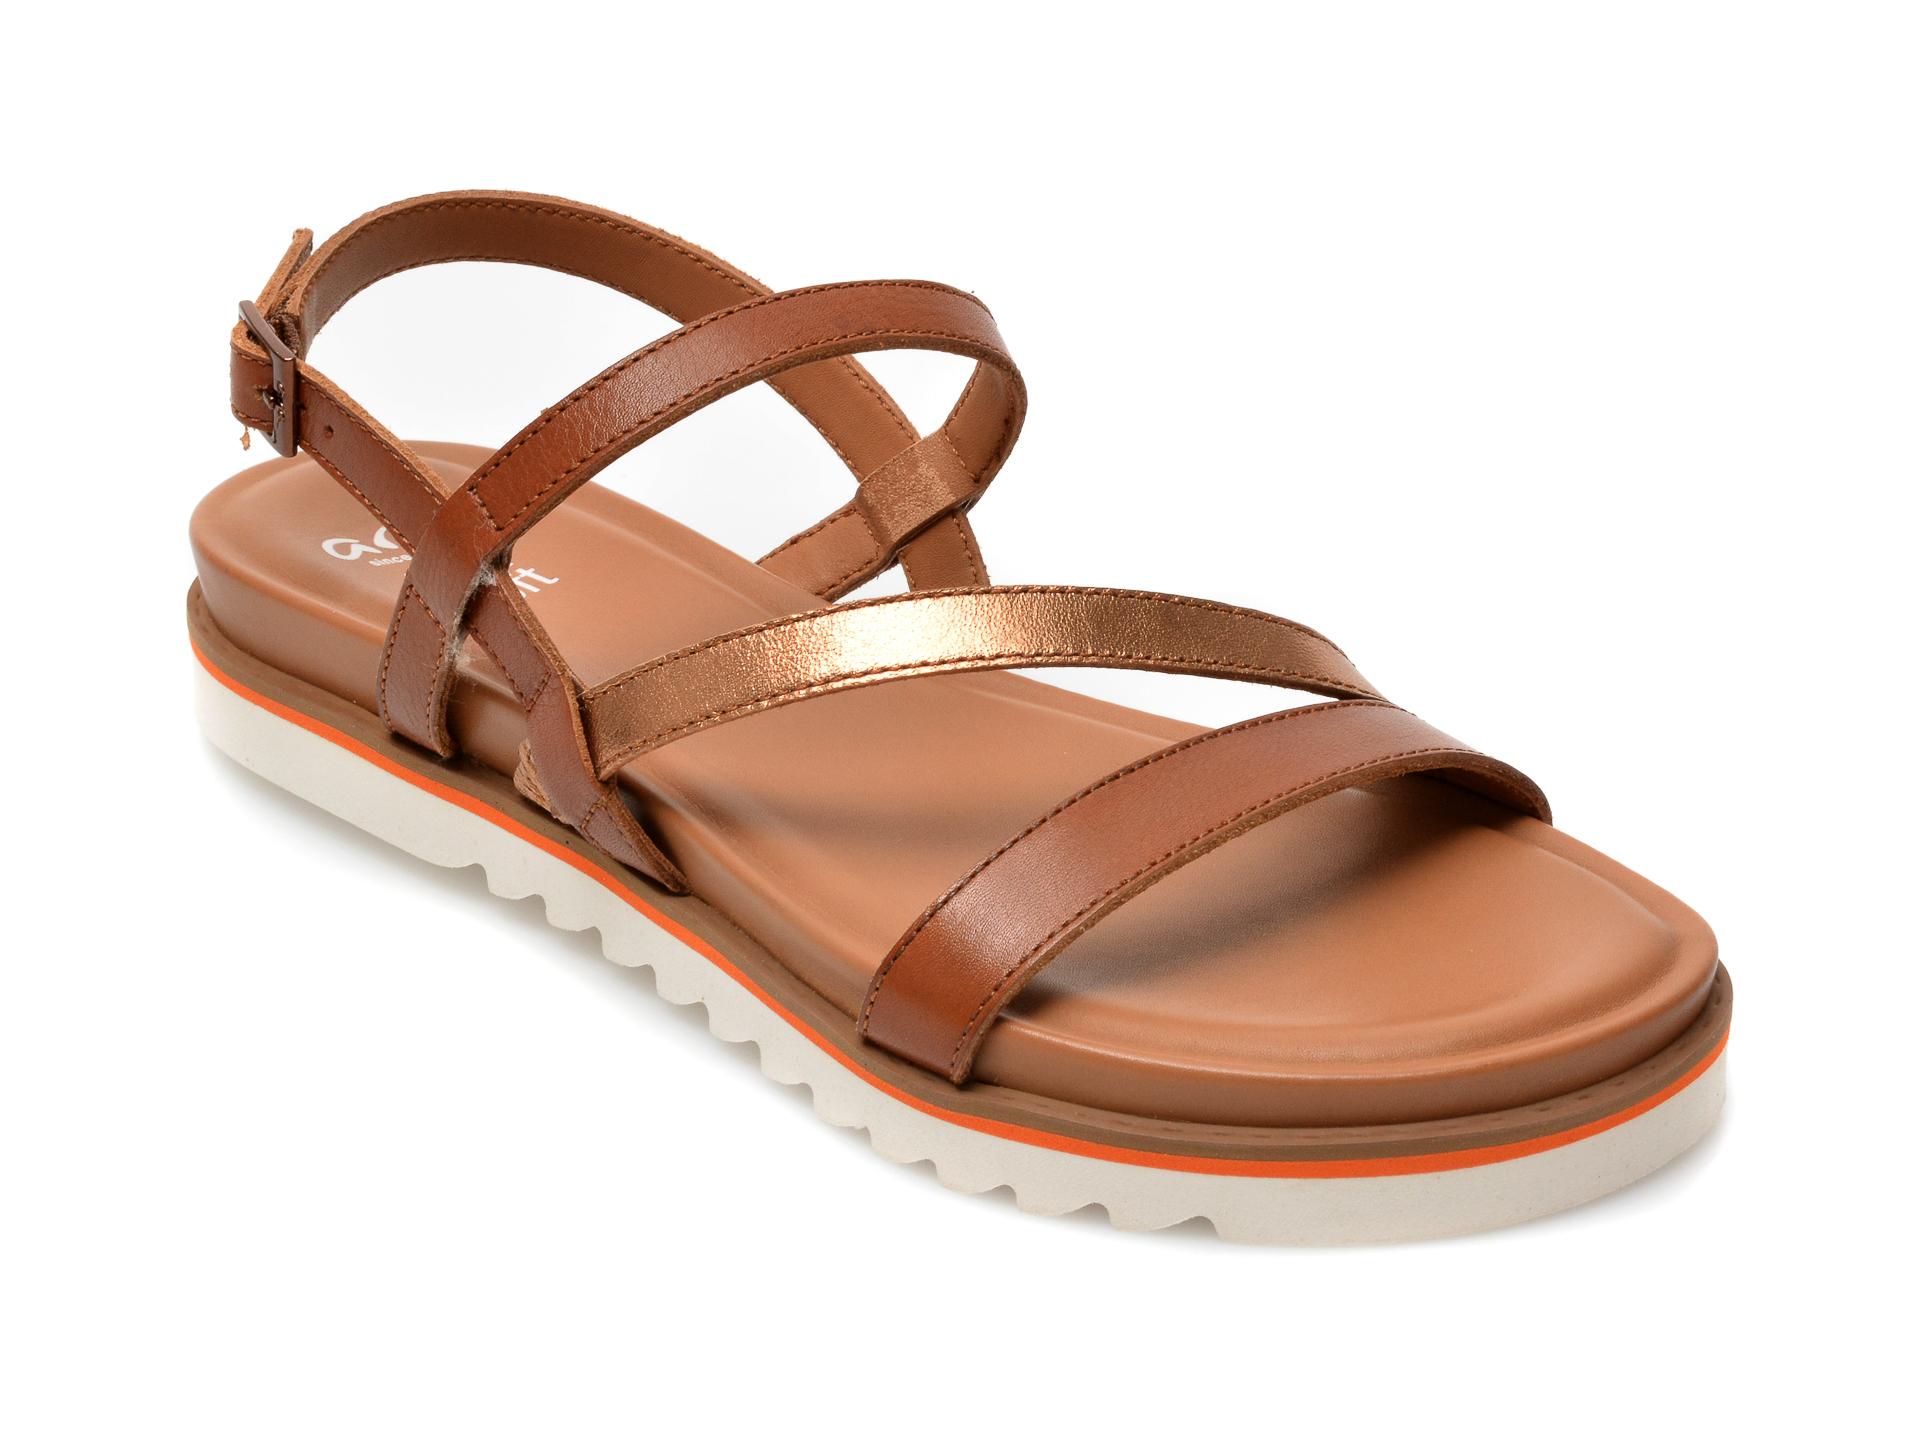 Sandale ARA bej, 28054, din piele naturala imagine otter.ro 2021